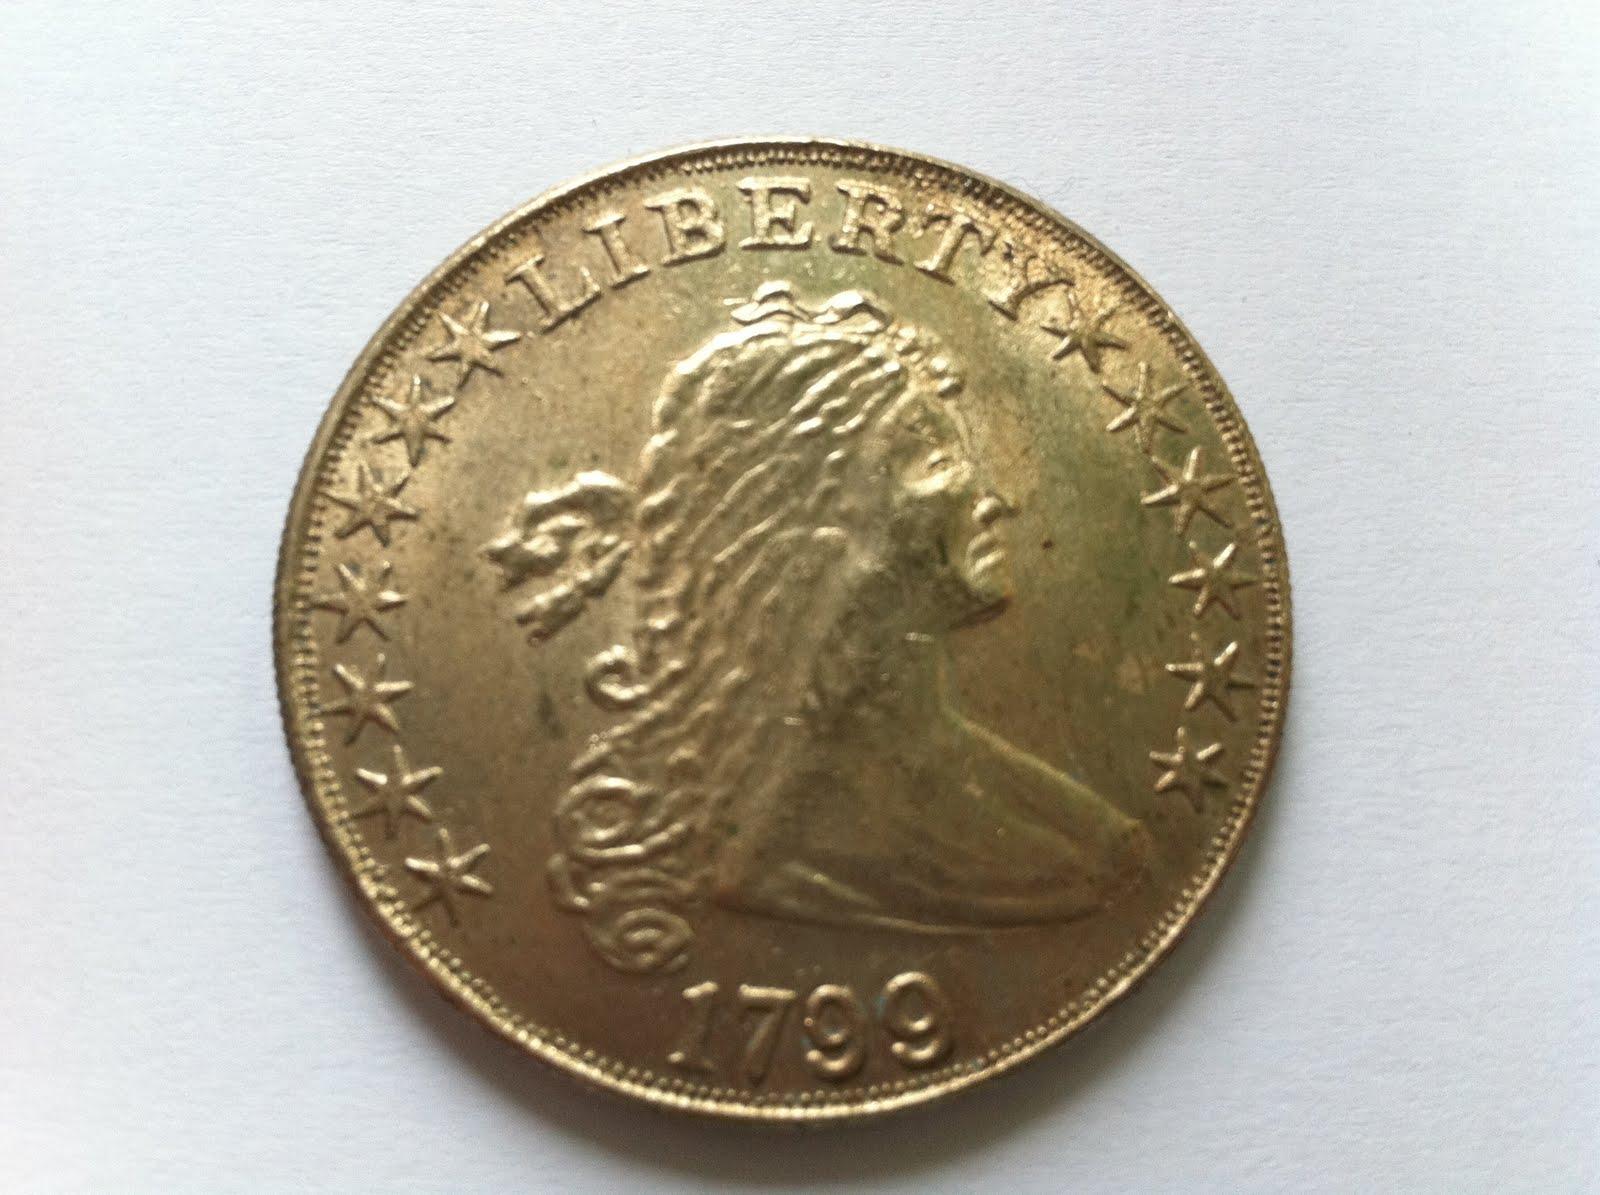 Old Liberty Coins 1799 Liberty Silver Coin